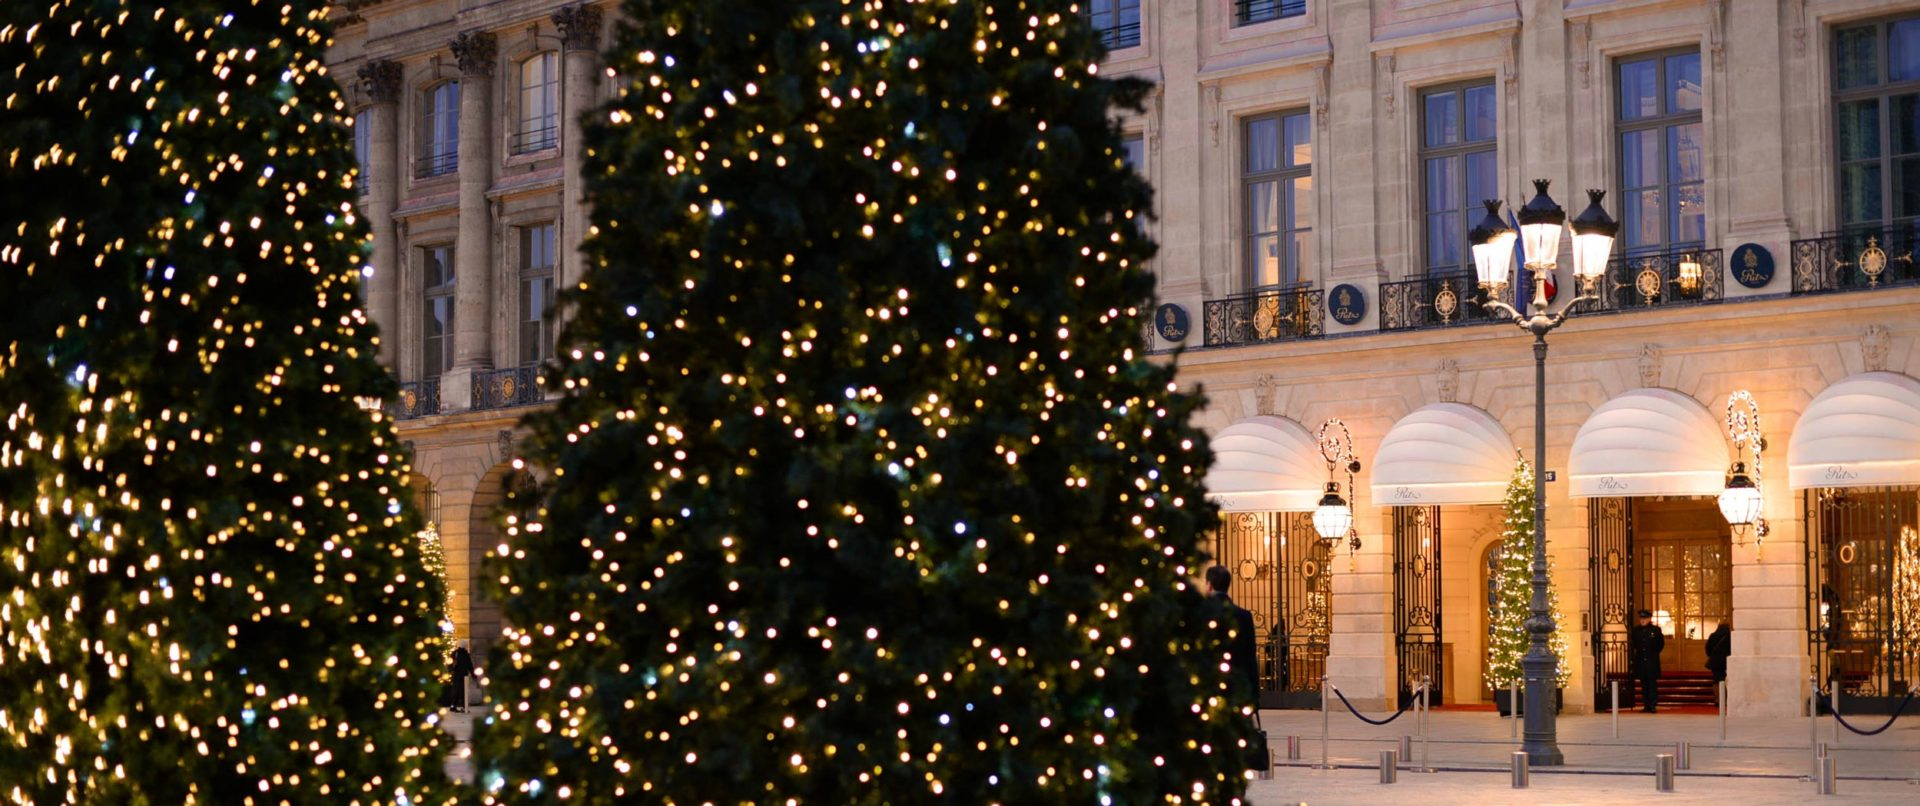 christmas-illuminations-activity-small-group-paris